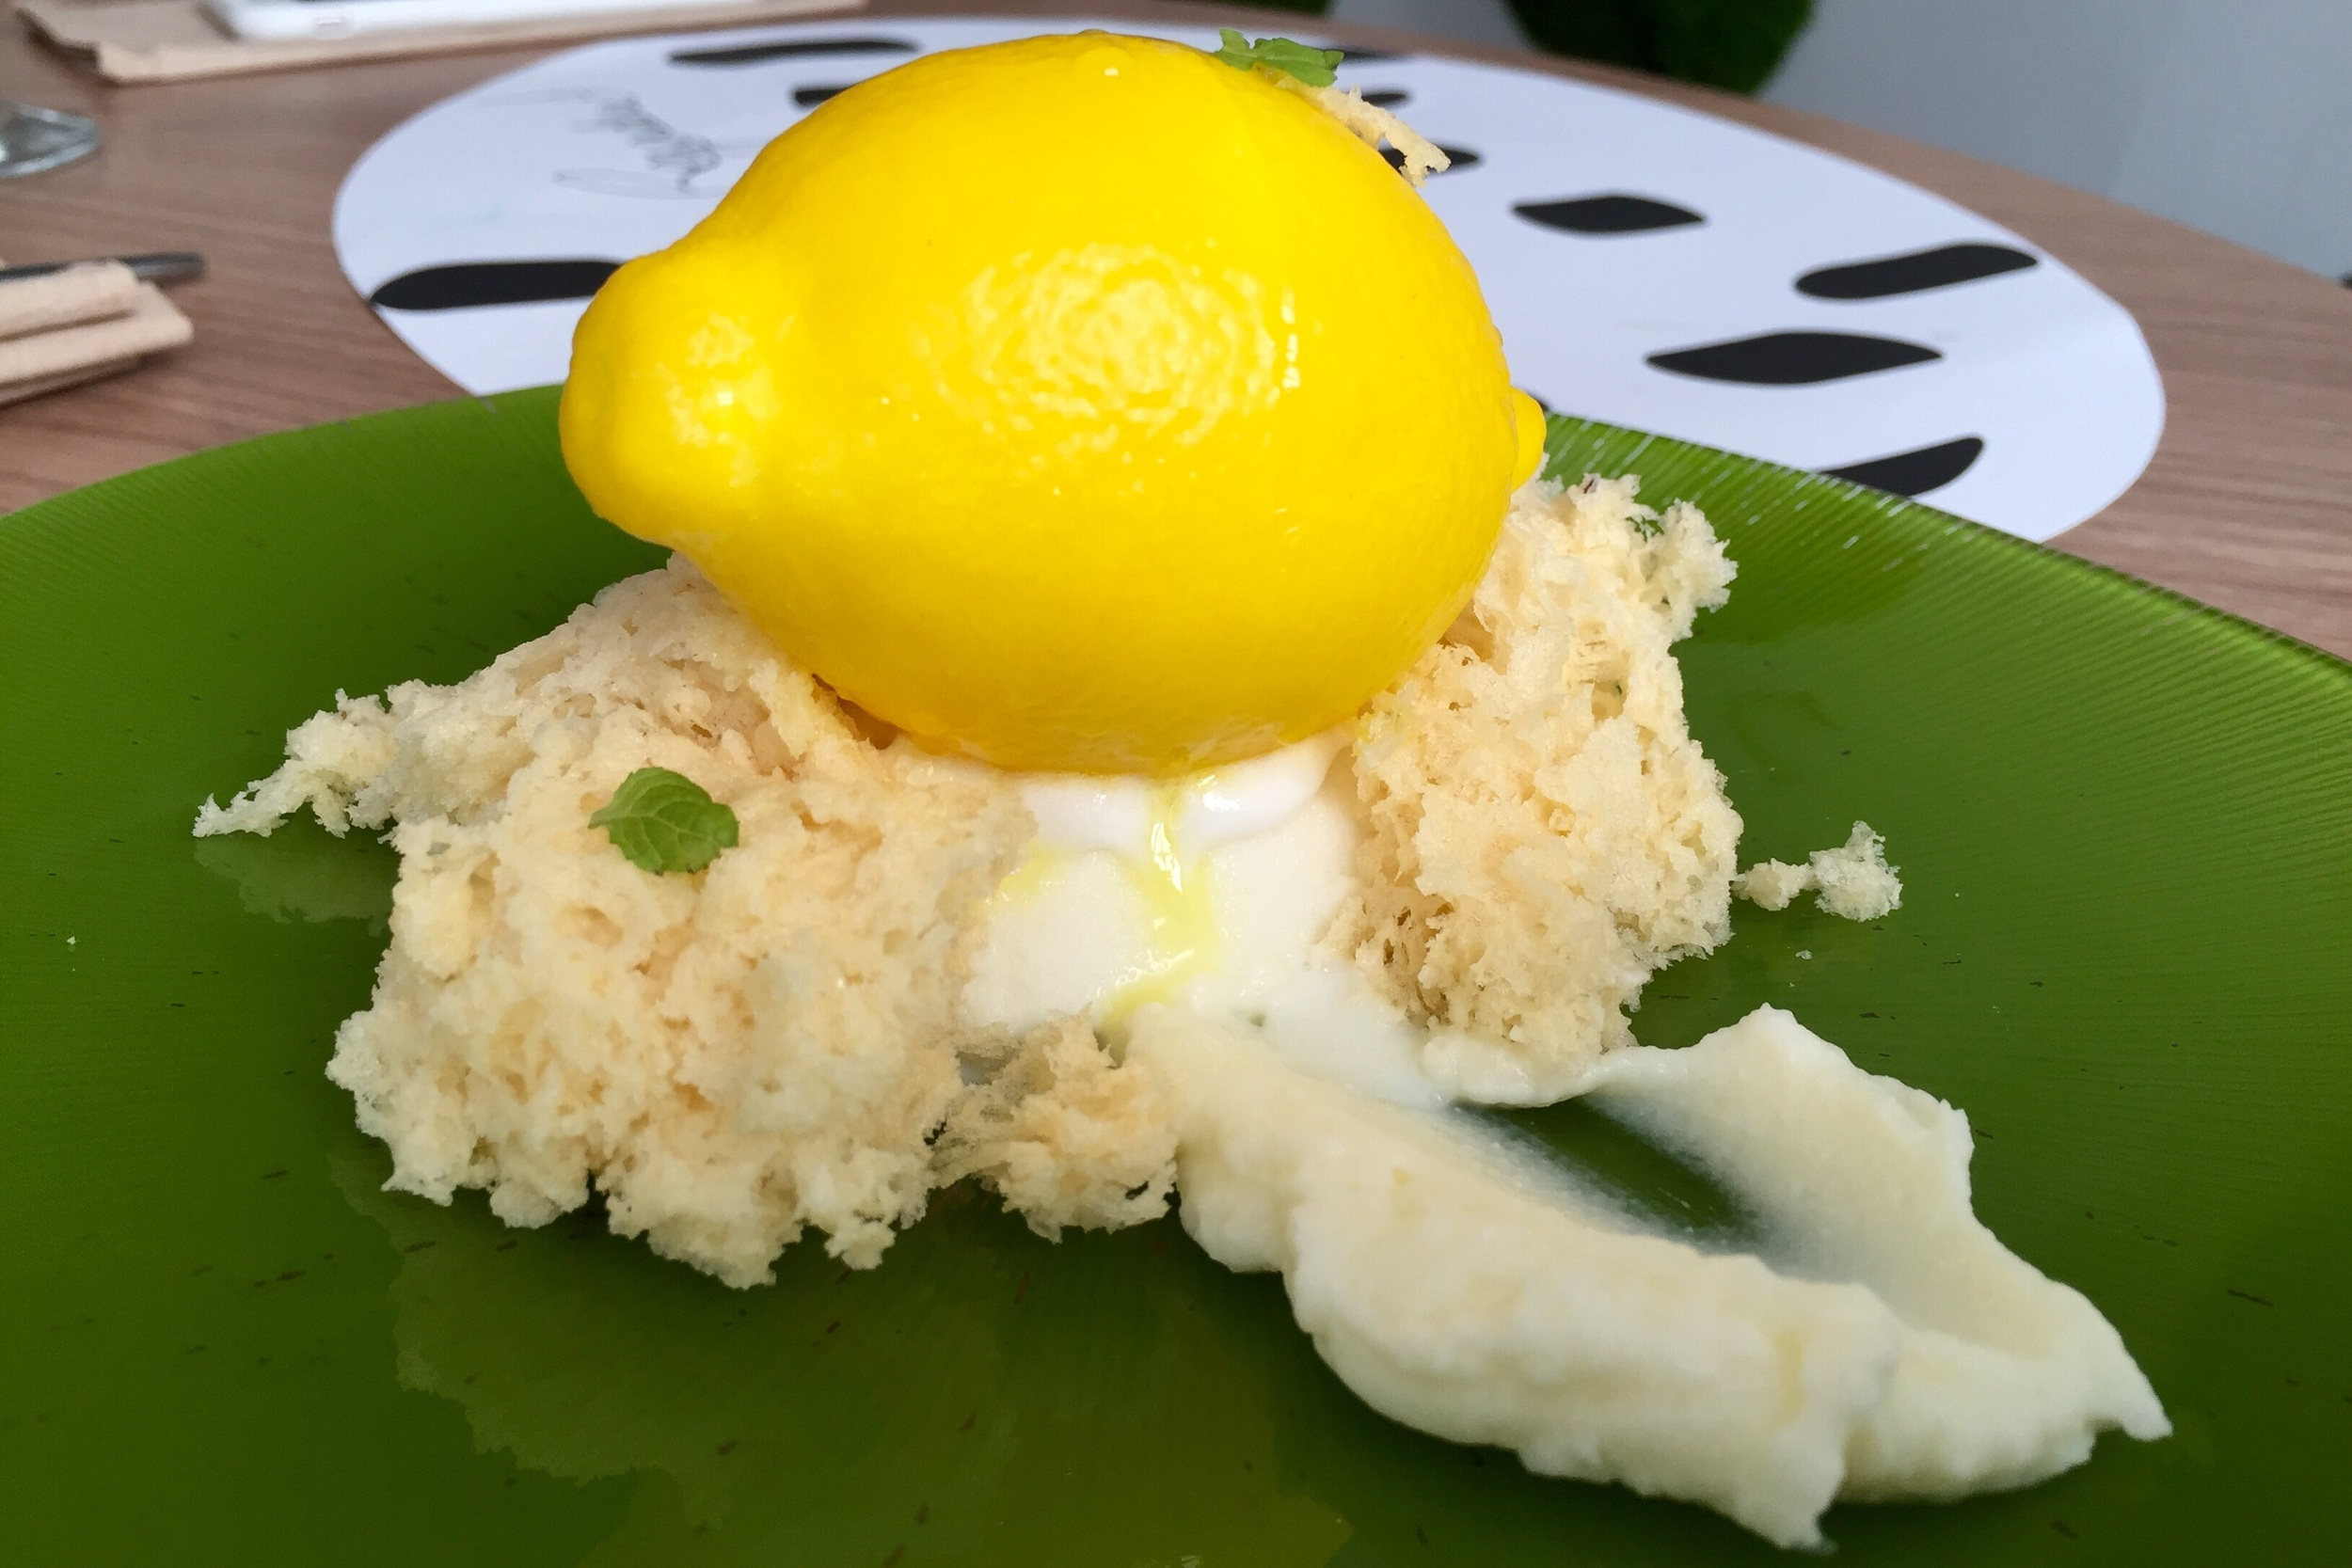 Lemon Drain! Foam, cream, ice cream, sponge cake, and leaves